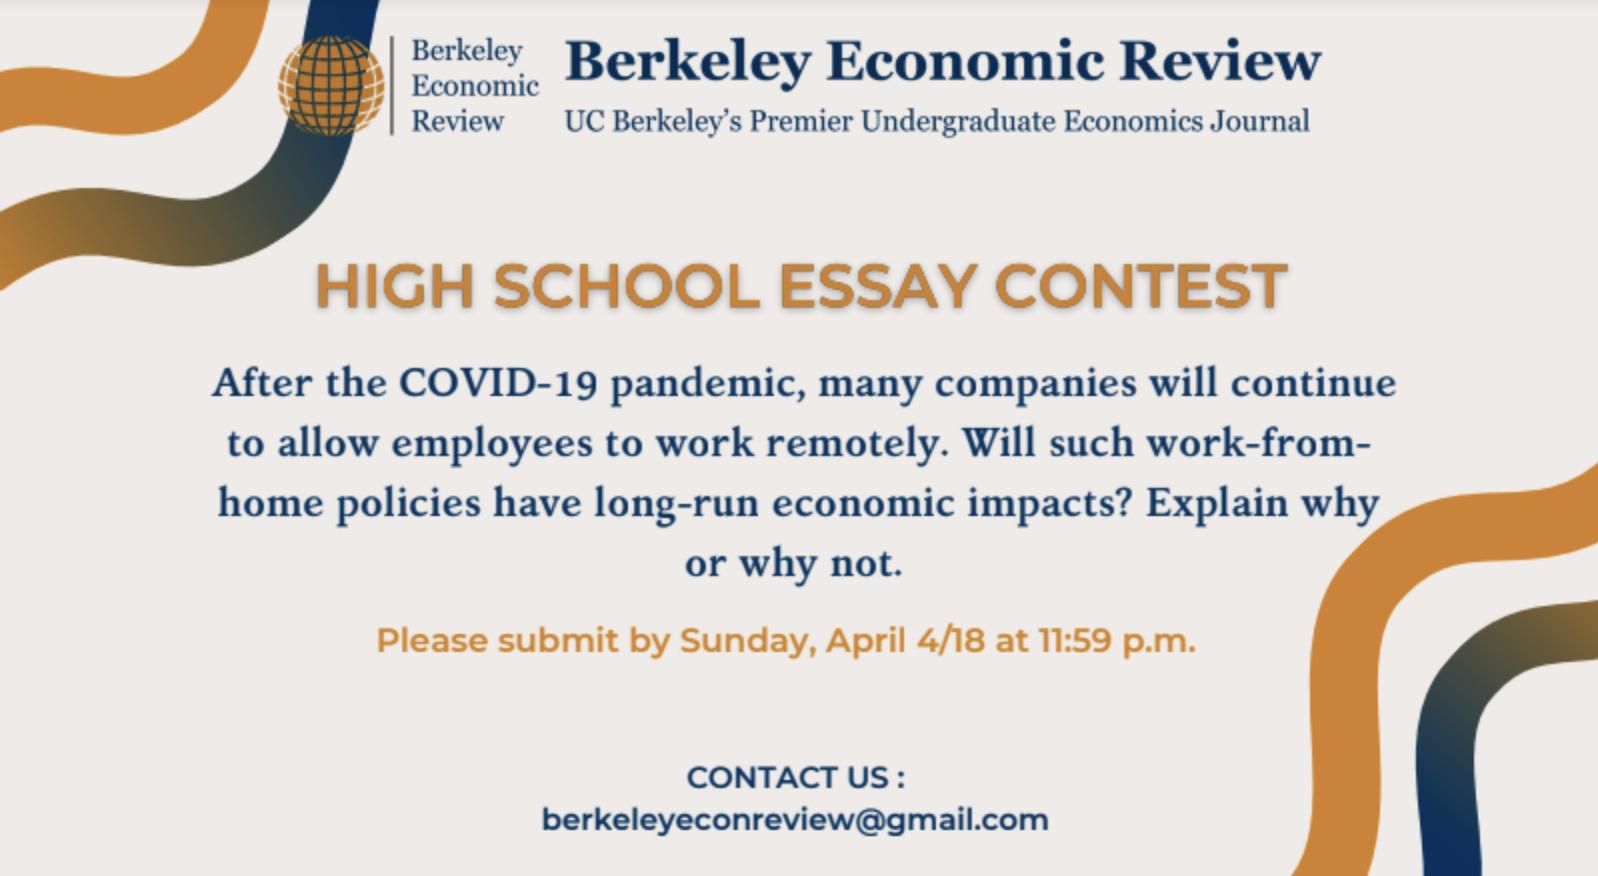 Spring 2021 High School Essay Contest